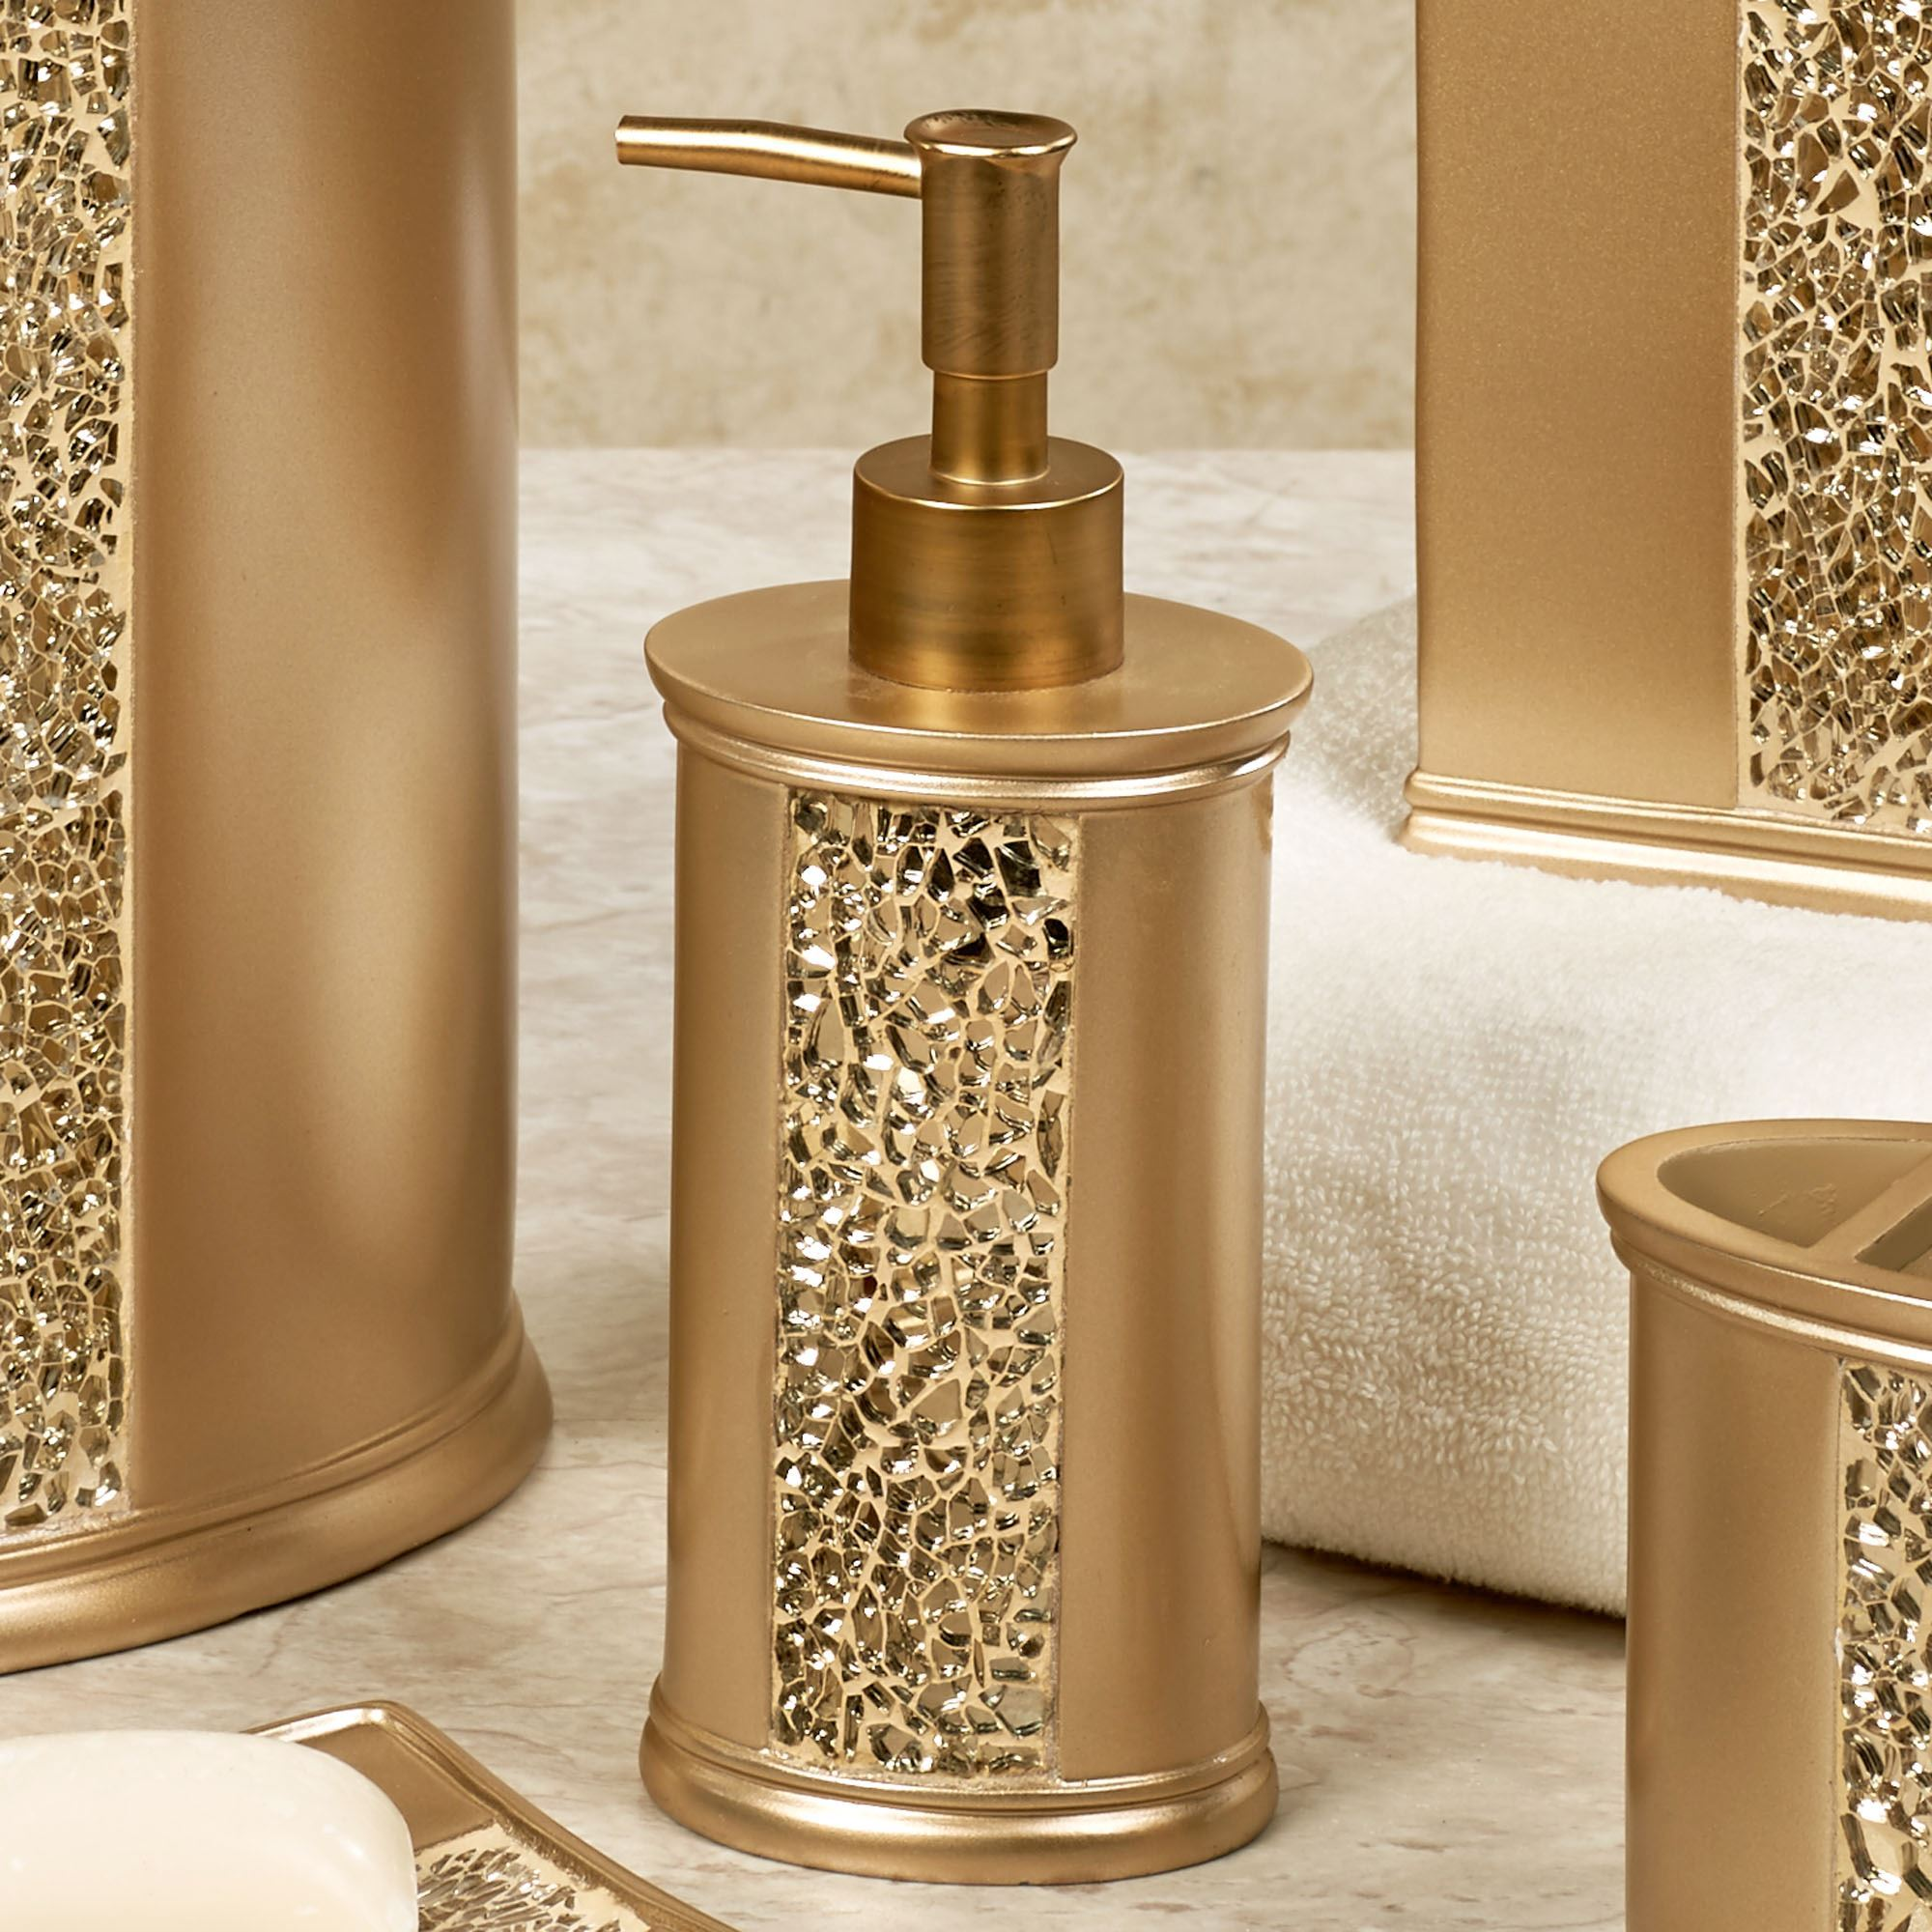 very gold mosaic bathroom accessories. Prestigue Lotion Soap Dispenser Champagne Gold Mosaic Bath Accents